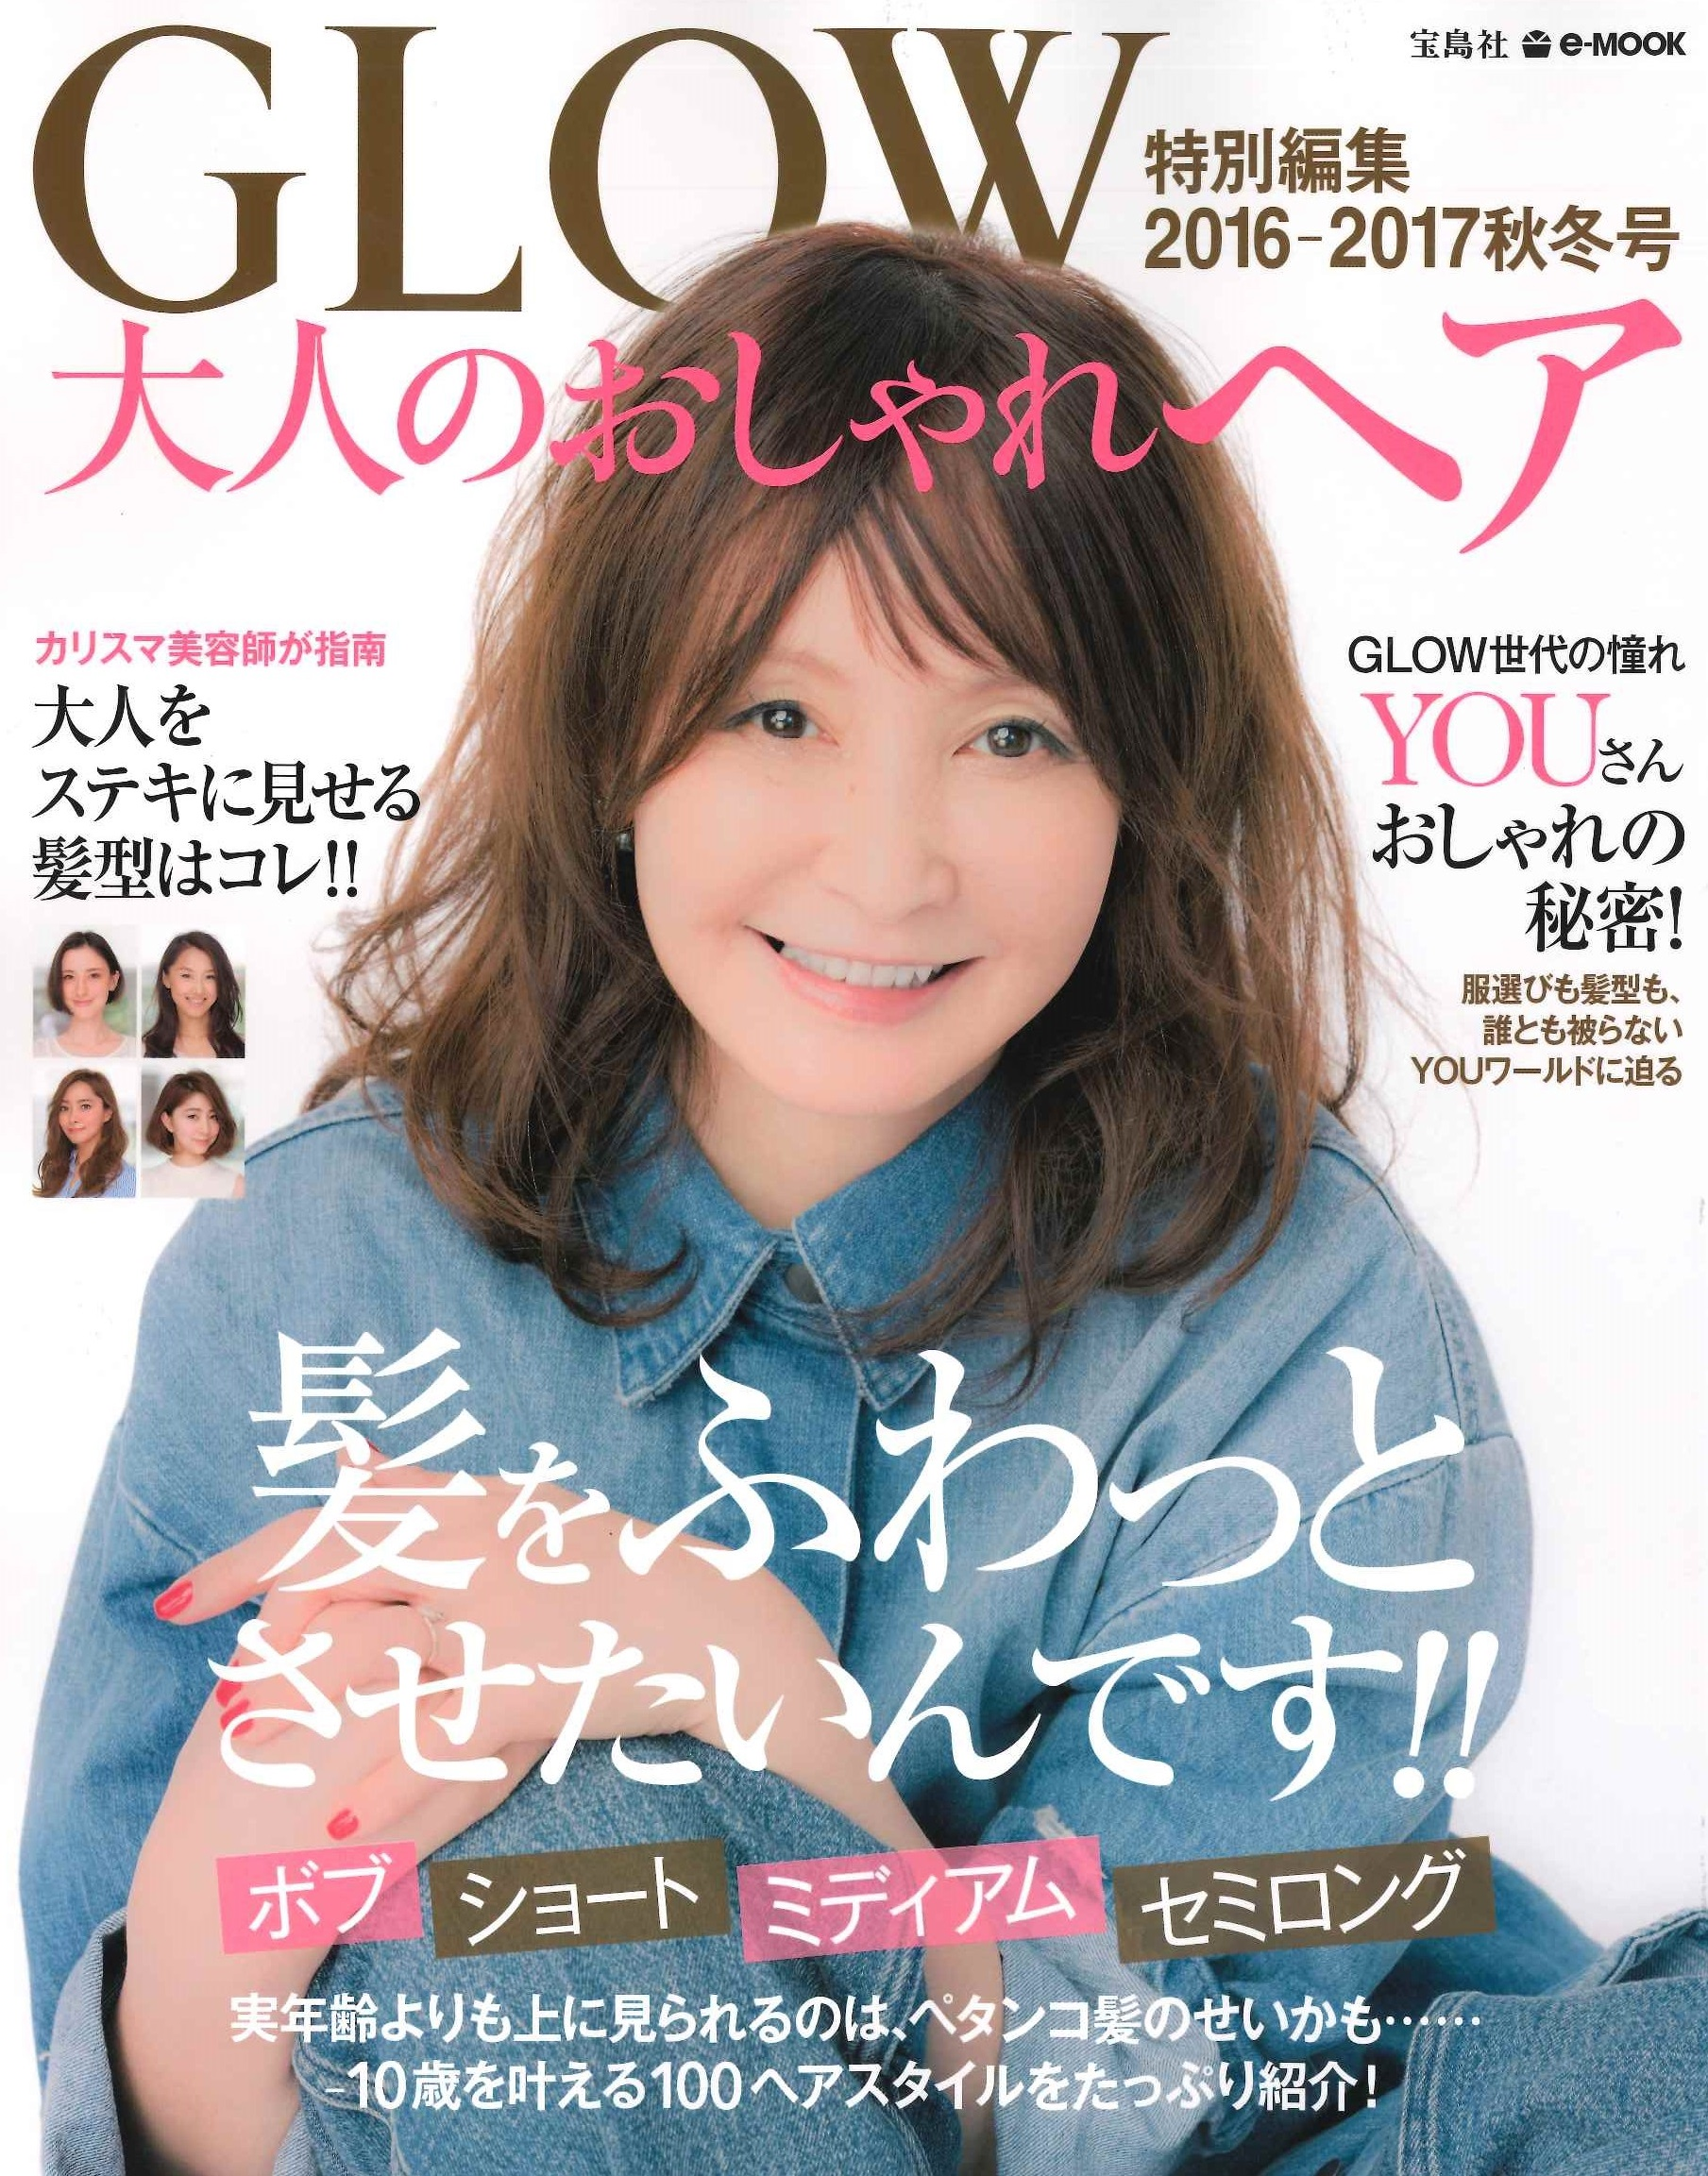 GLOW特別編集 大人のおしゃれヘア2016-2017秋冬号